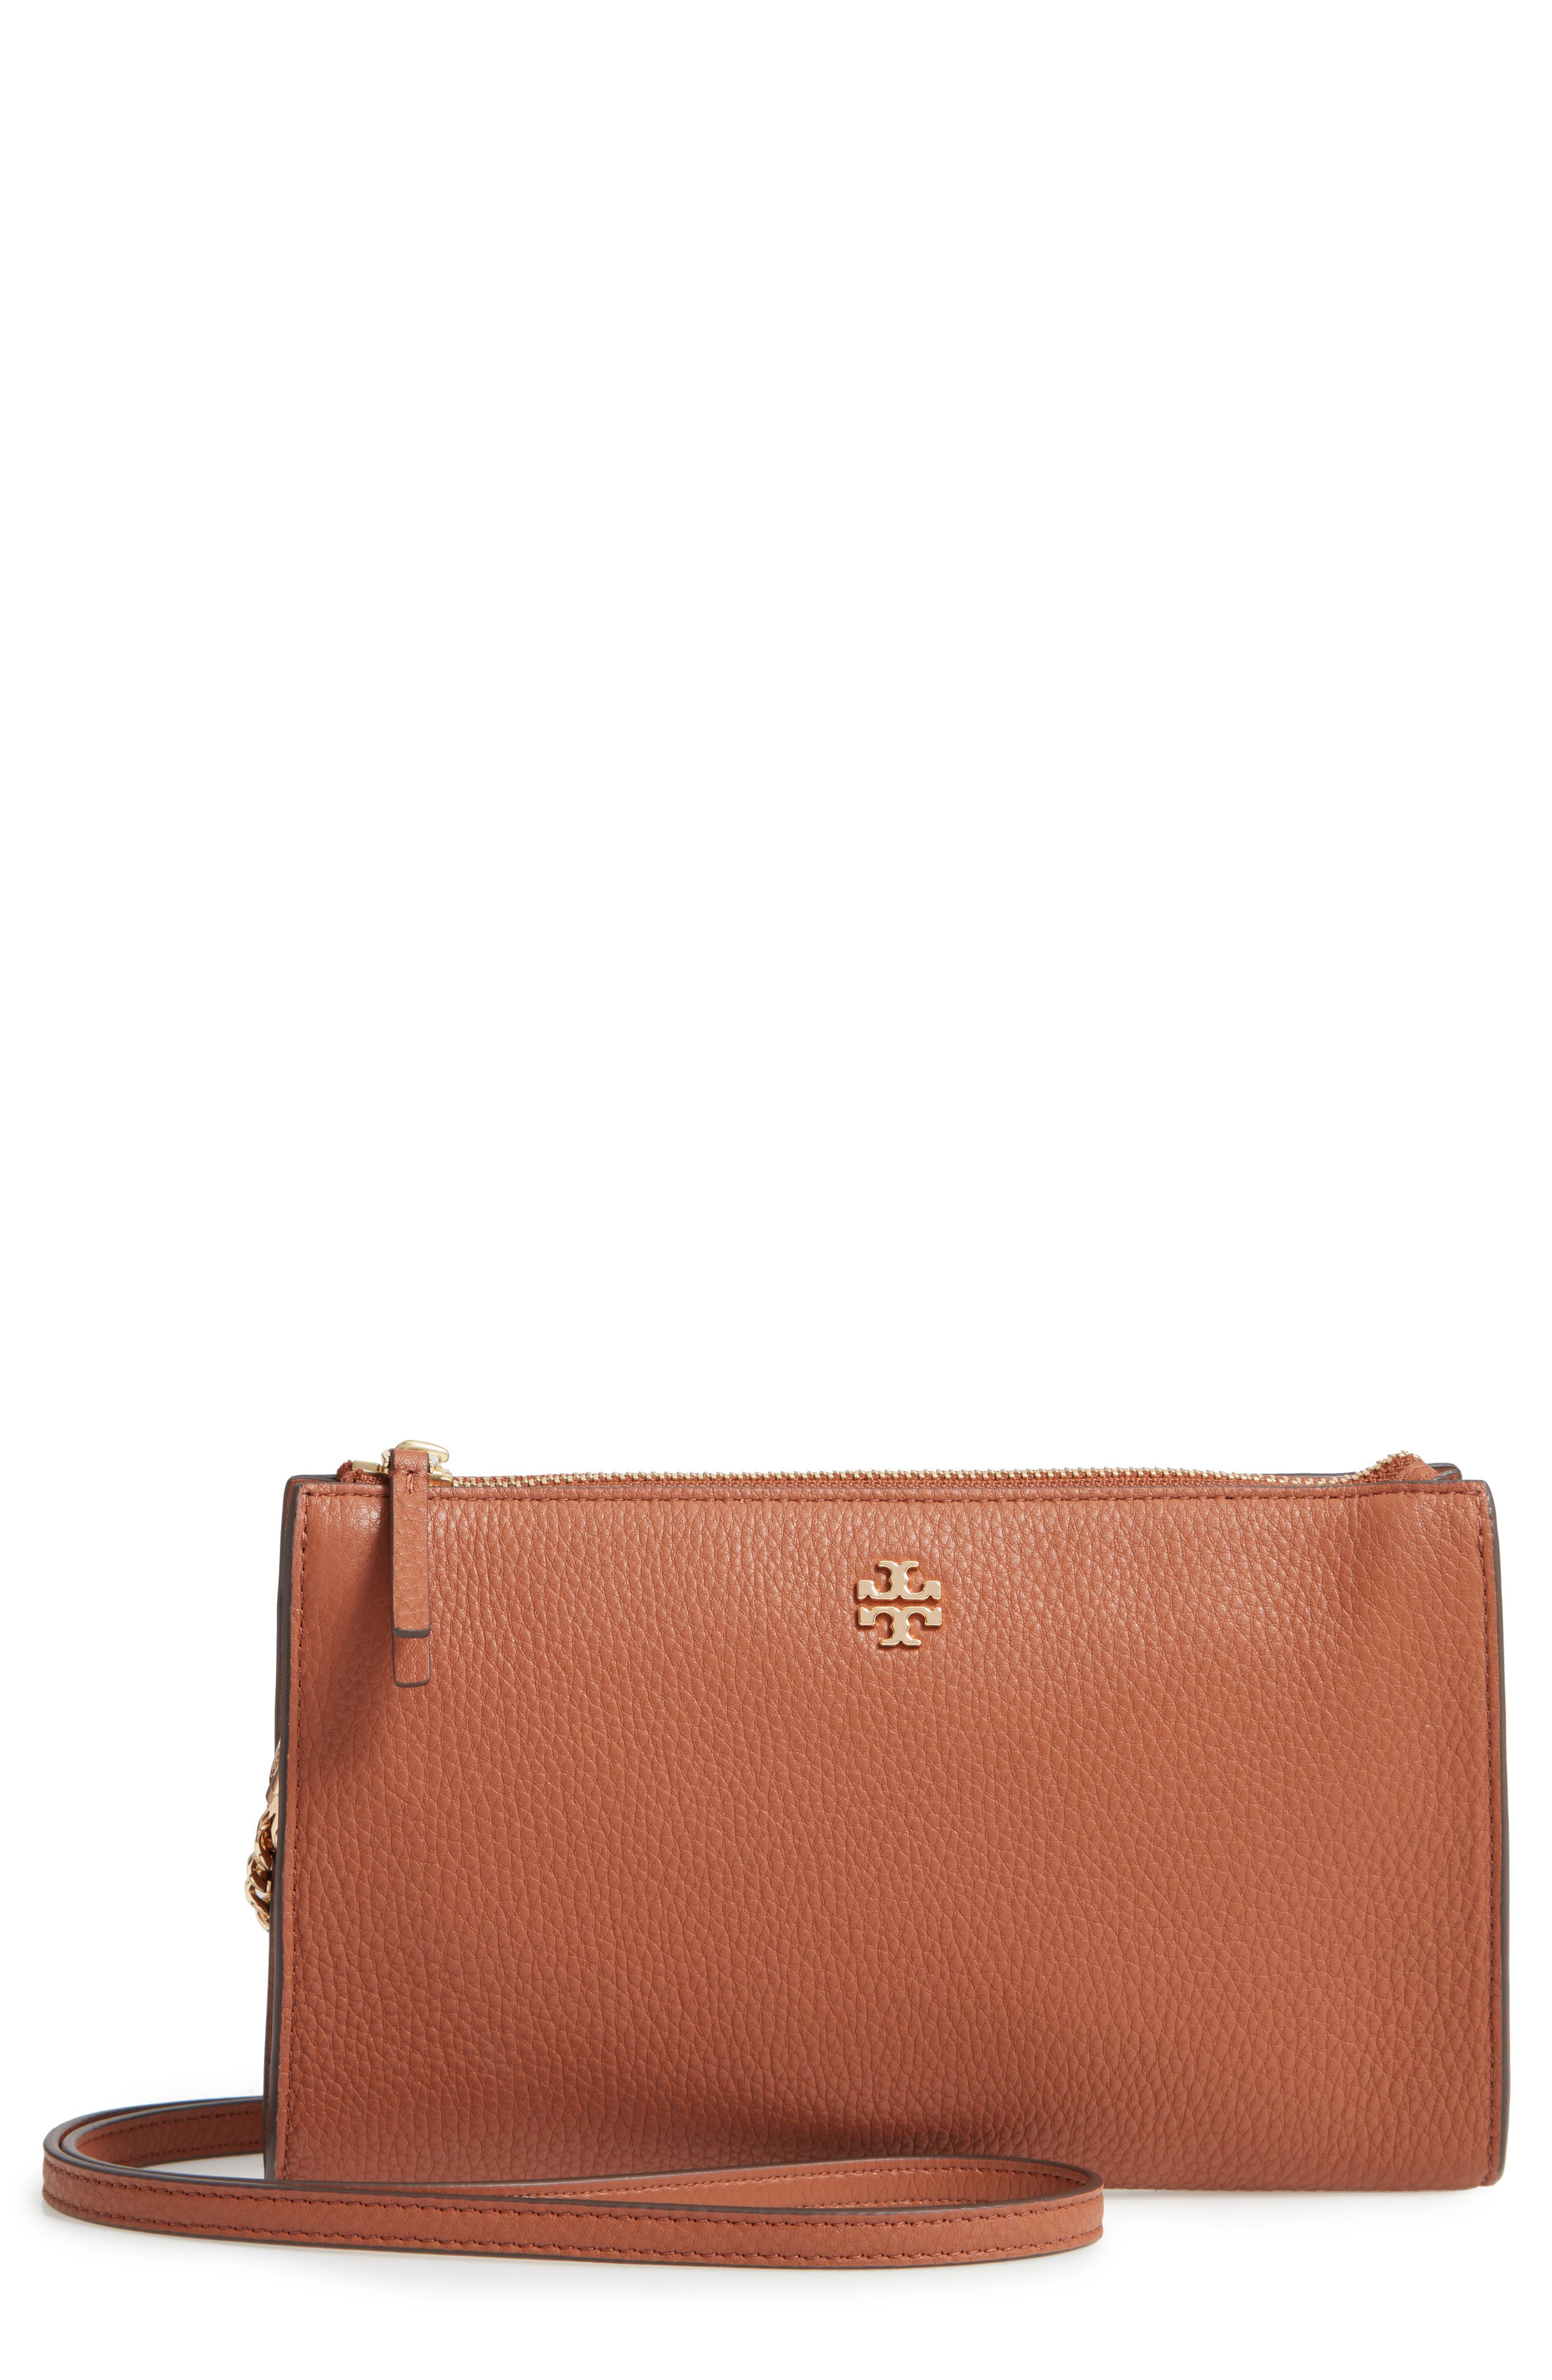 TORY BURCH Pebbled Leather Top Zip Crossbody Bag, Main, color, CLASSIC TAN